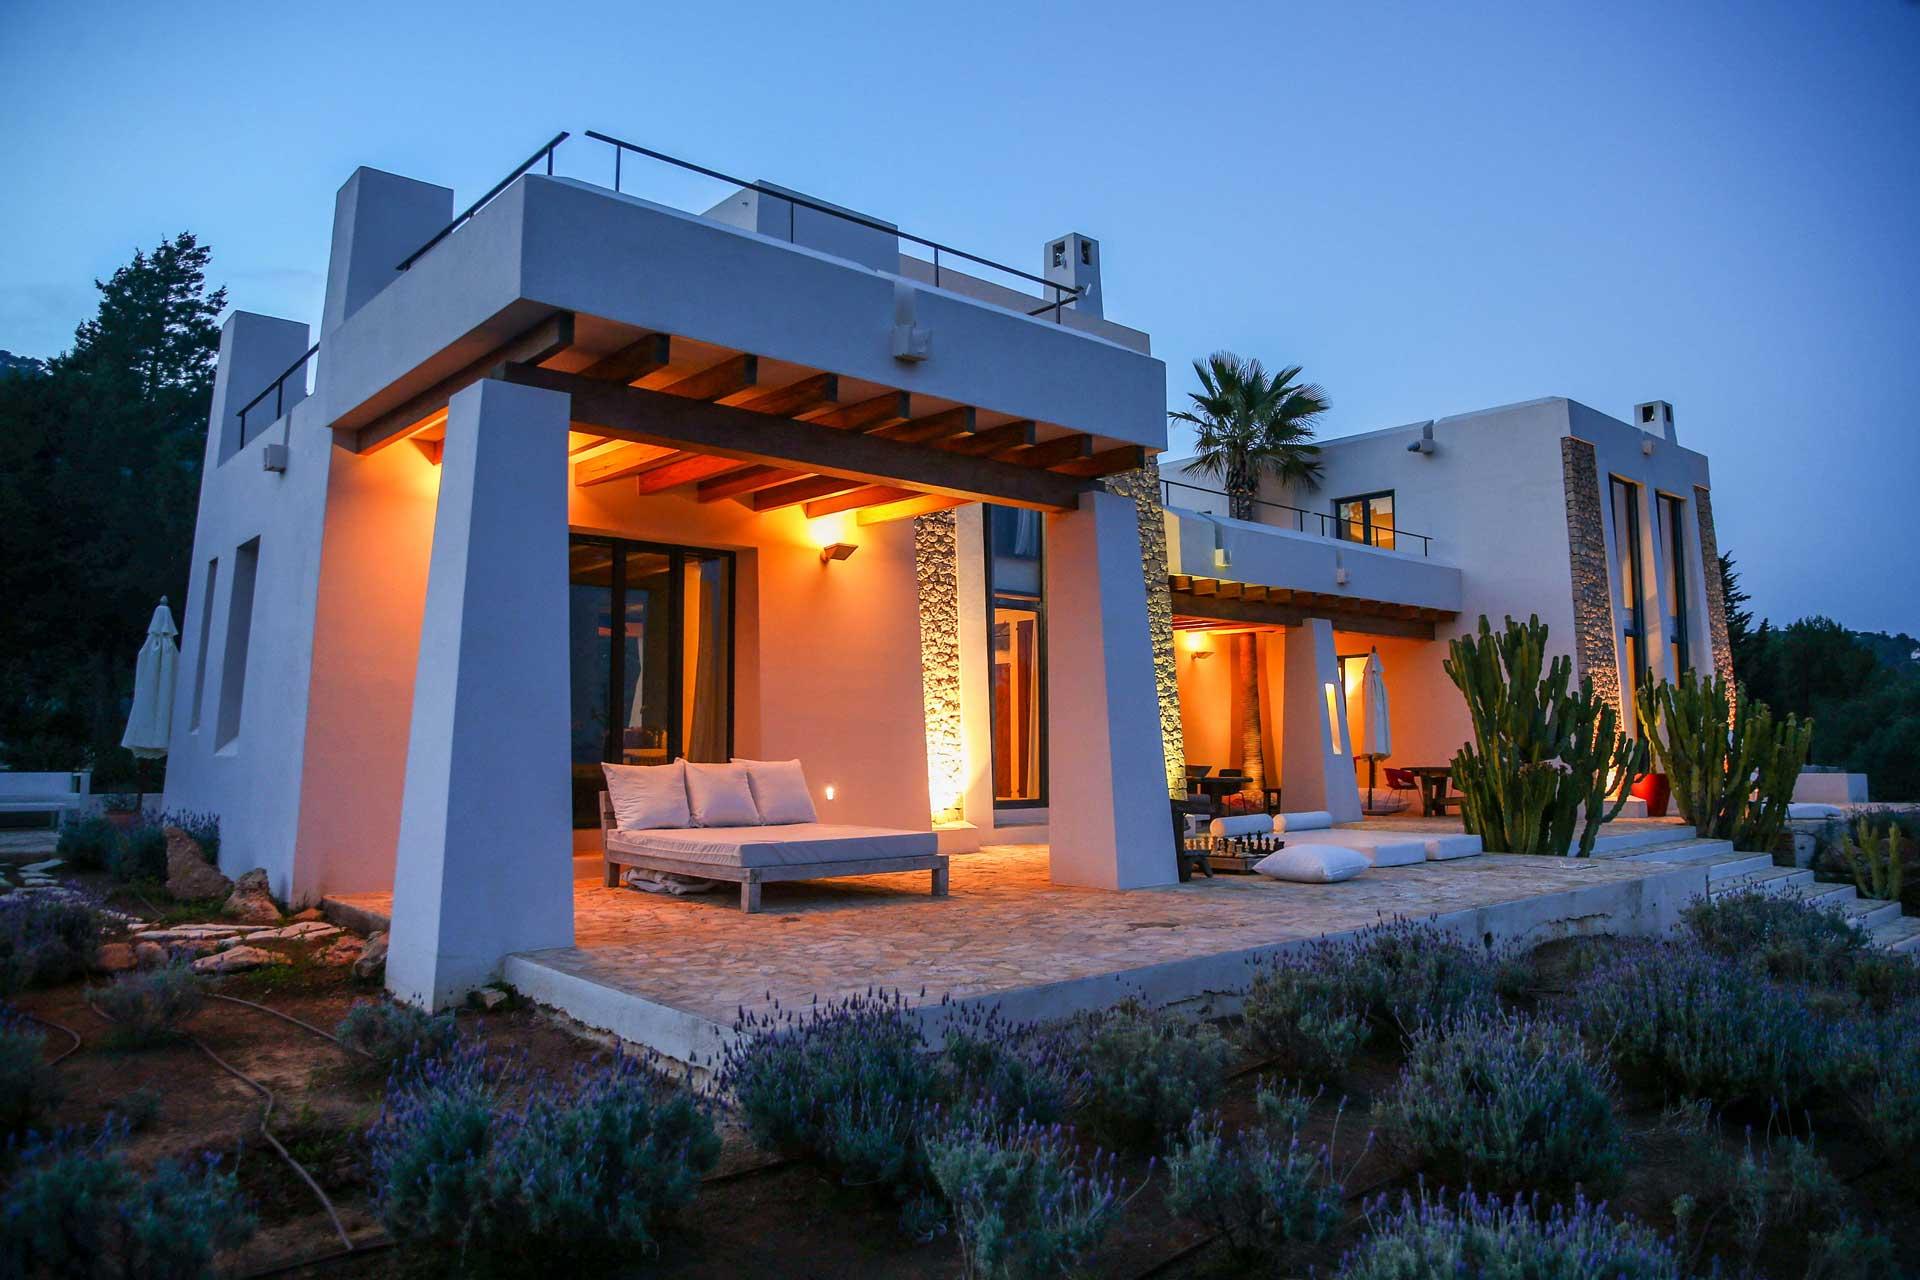 Villa Can Teresita by night